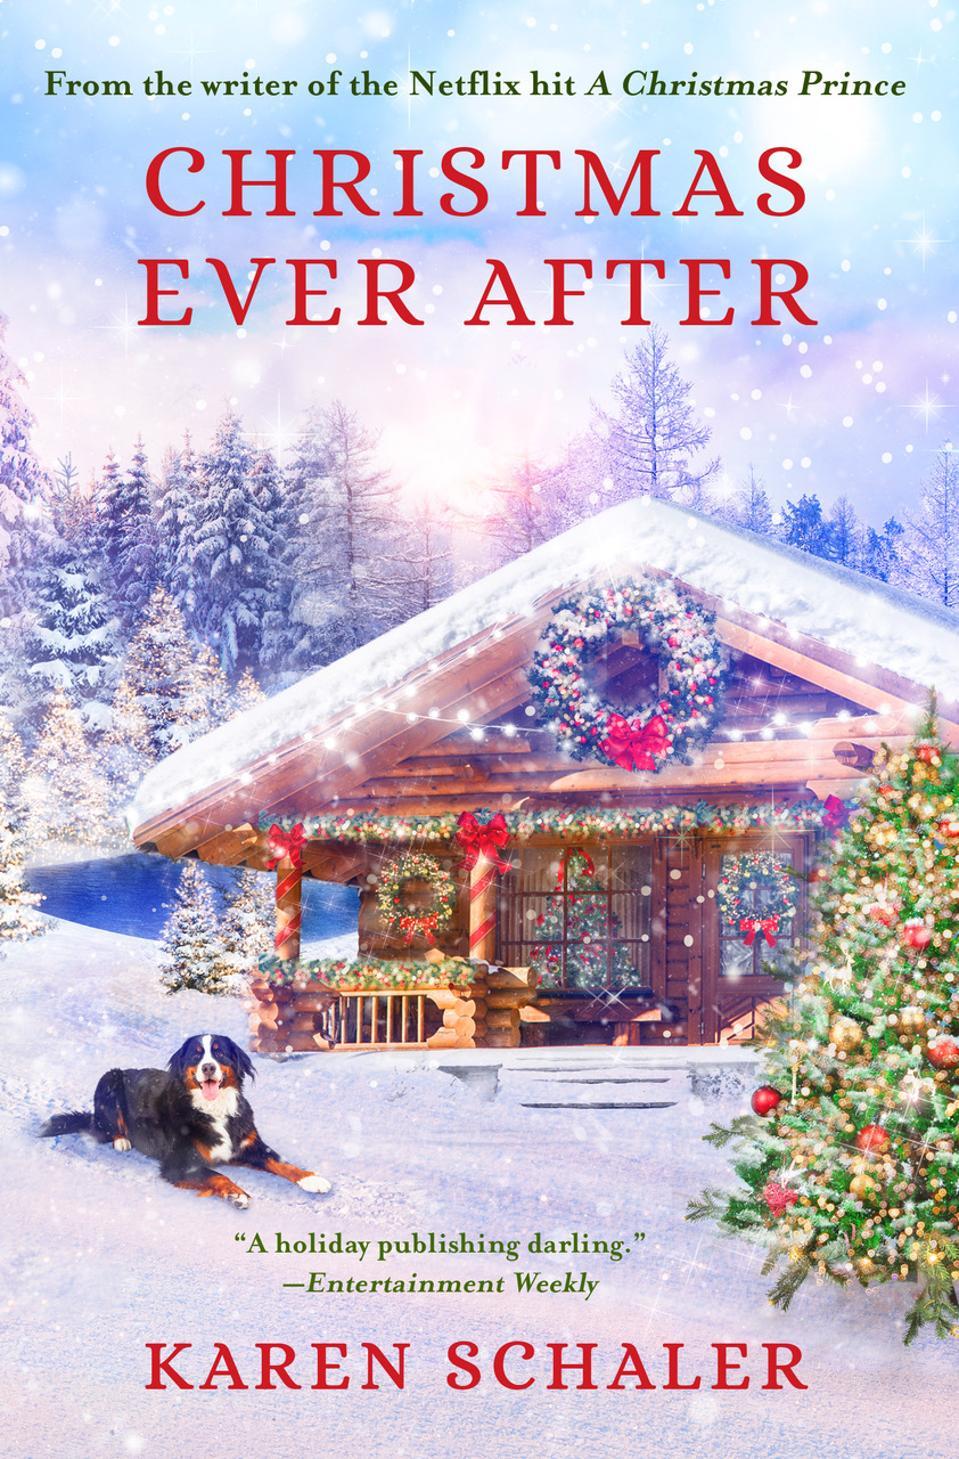 Karen Schaler's newest novel Christmas Ever After